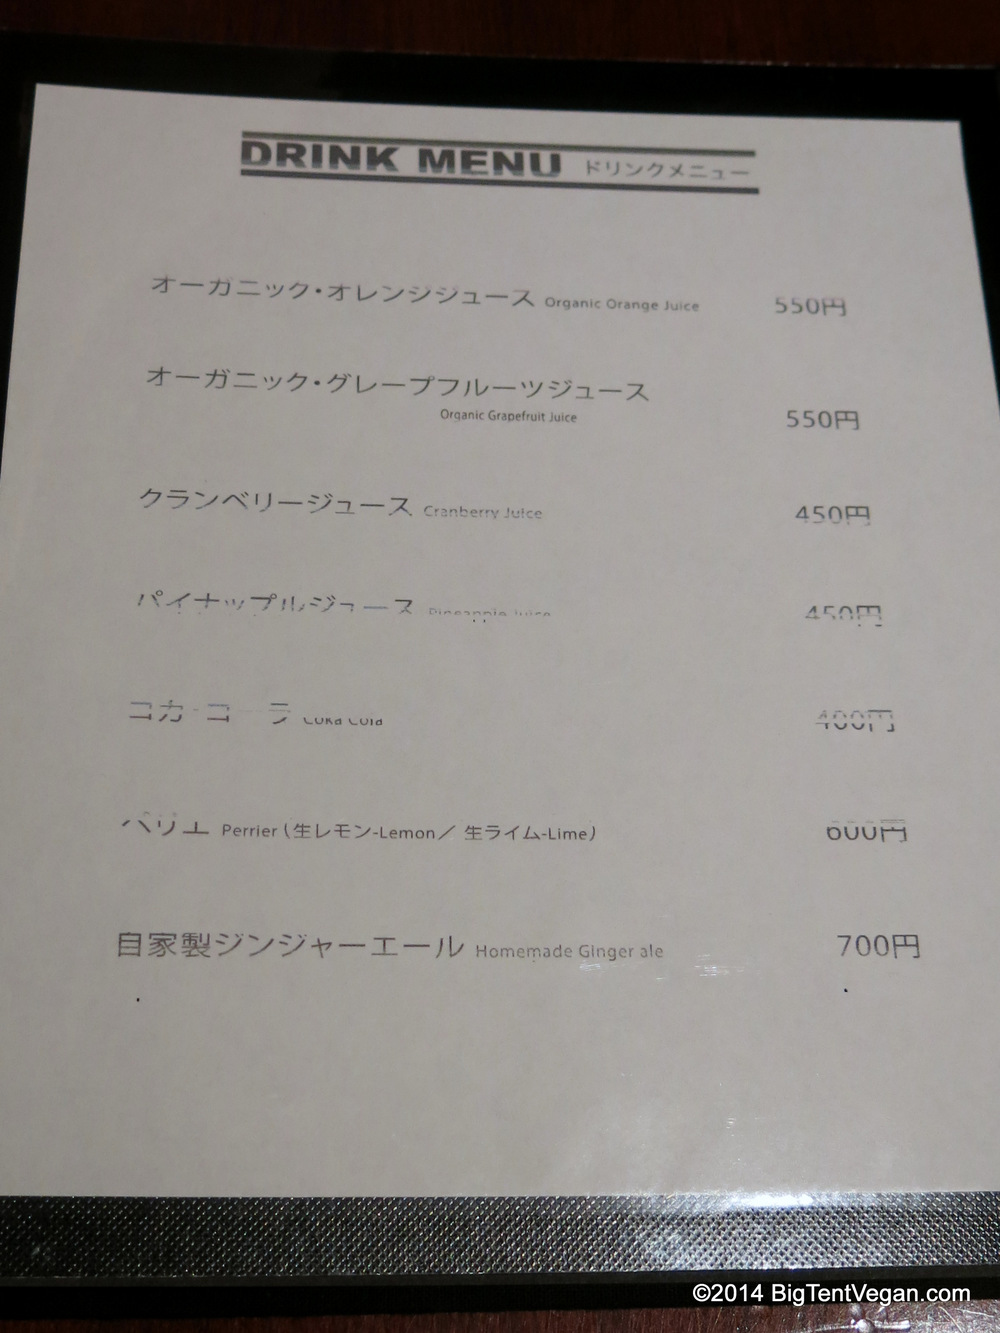 IMG_6620 - Copy.JPG